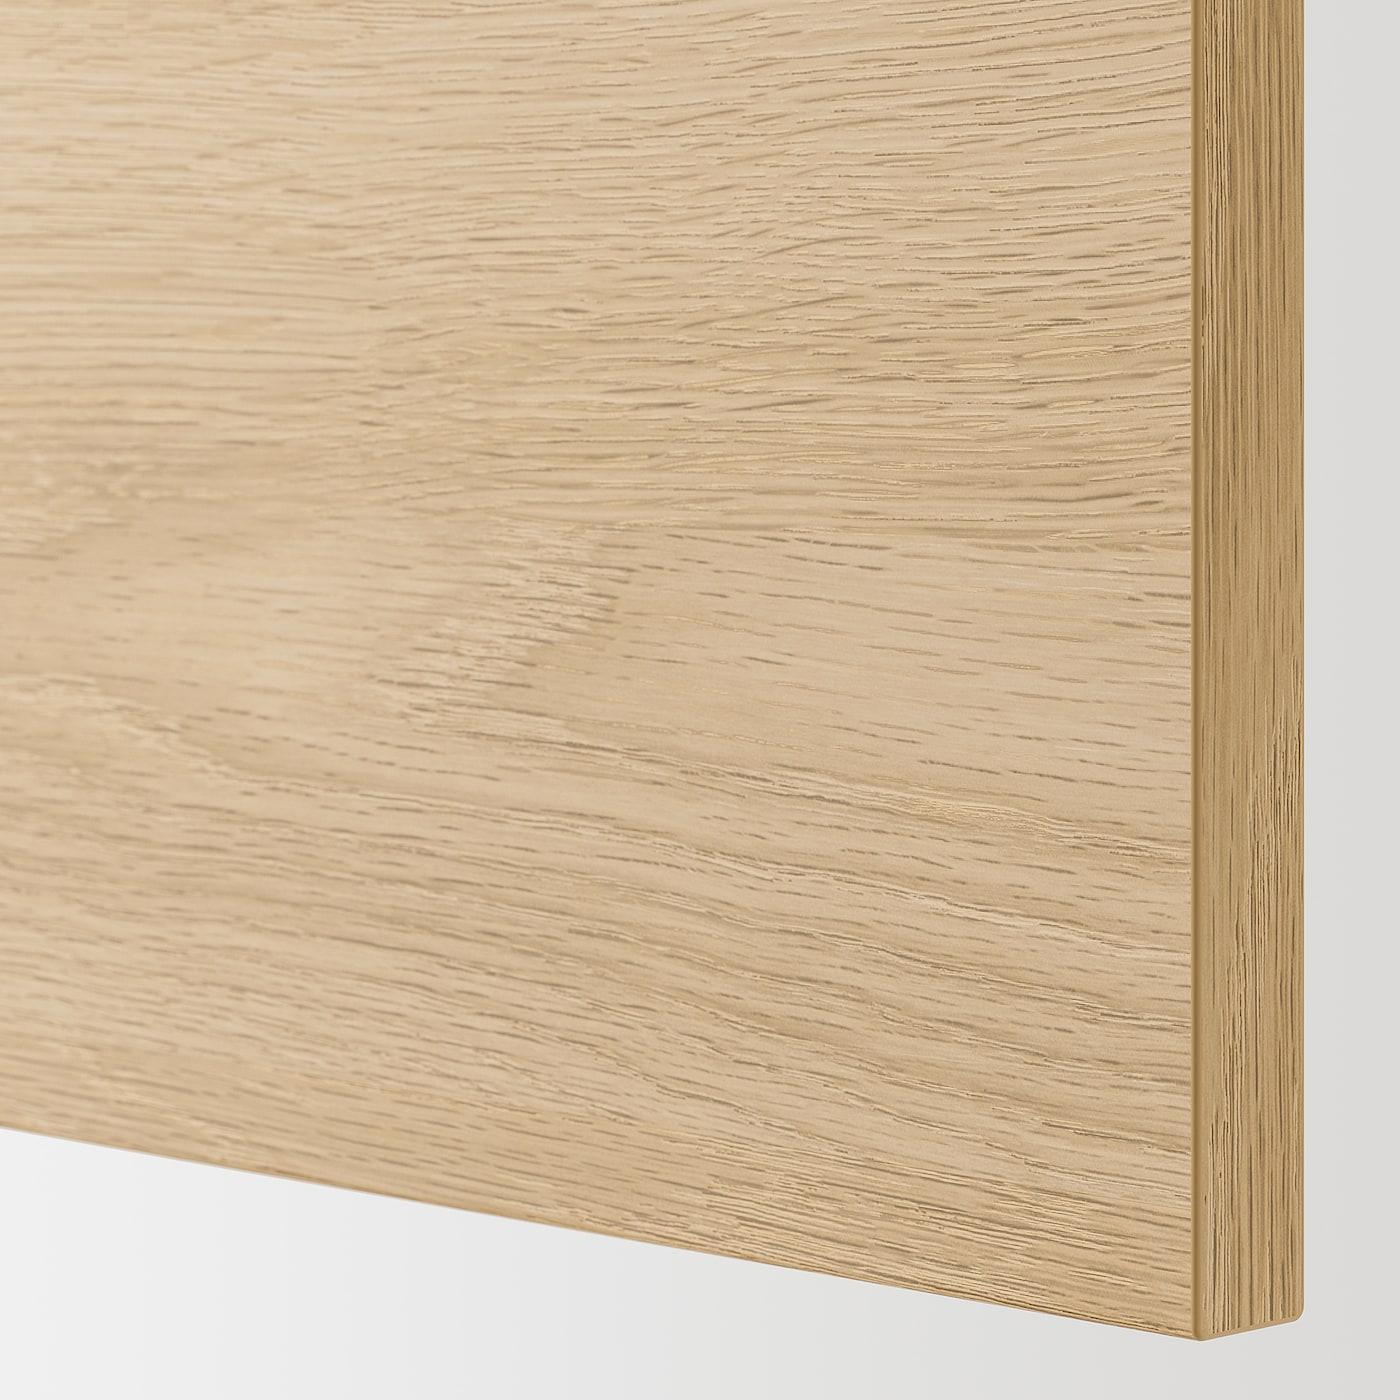 ENHET Usk 3 skuffer, hvid/egetræsmønstret, 40x60x75 cm